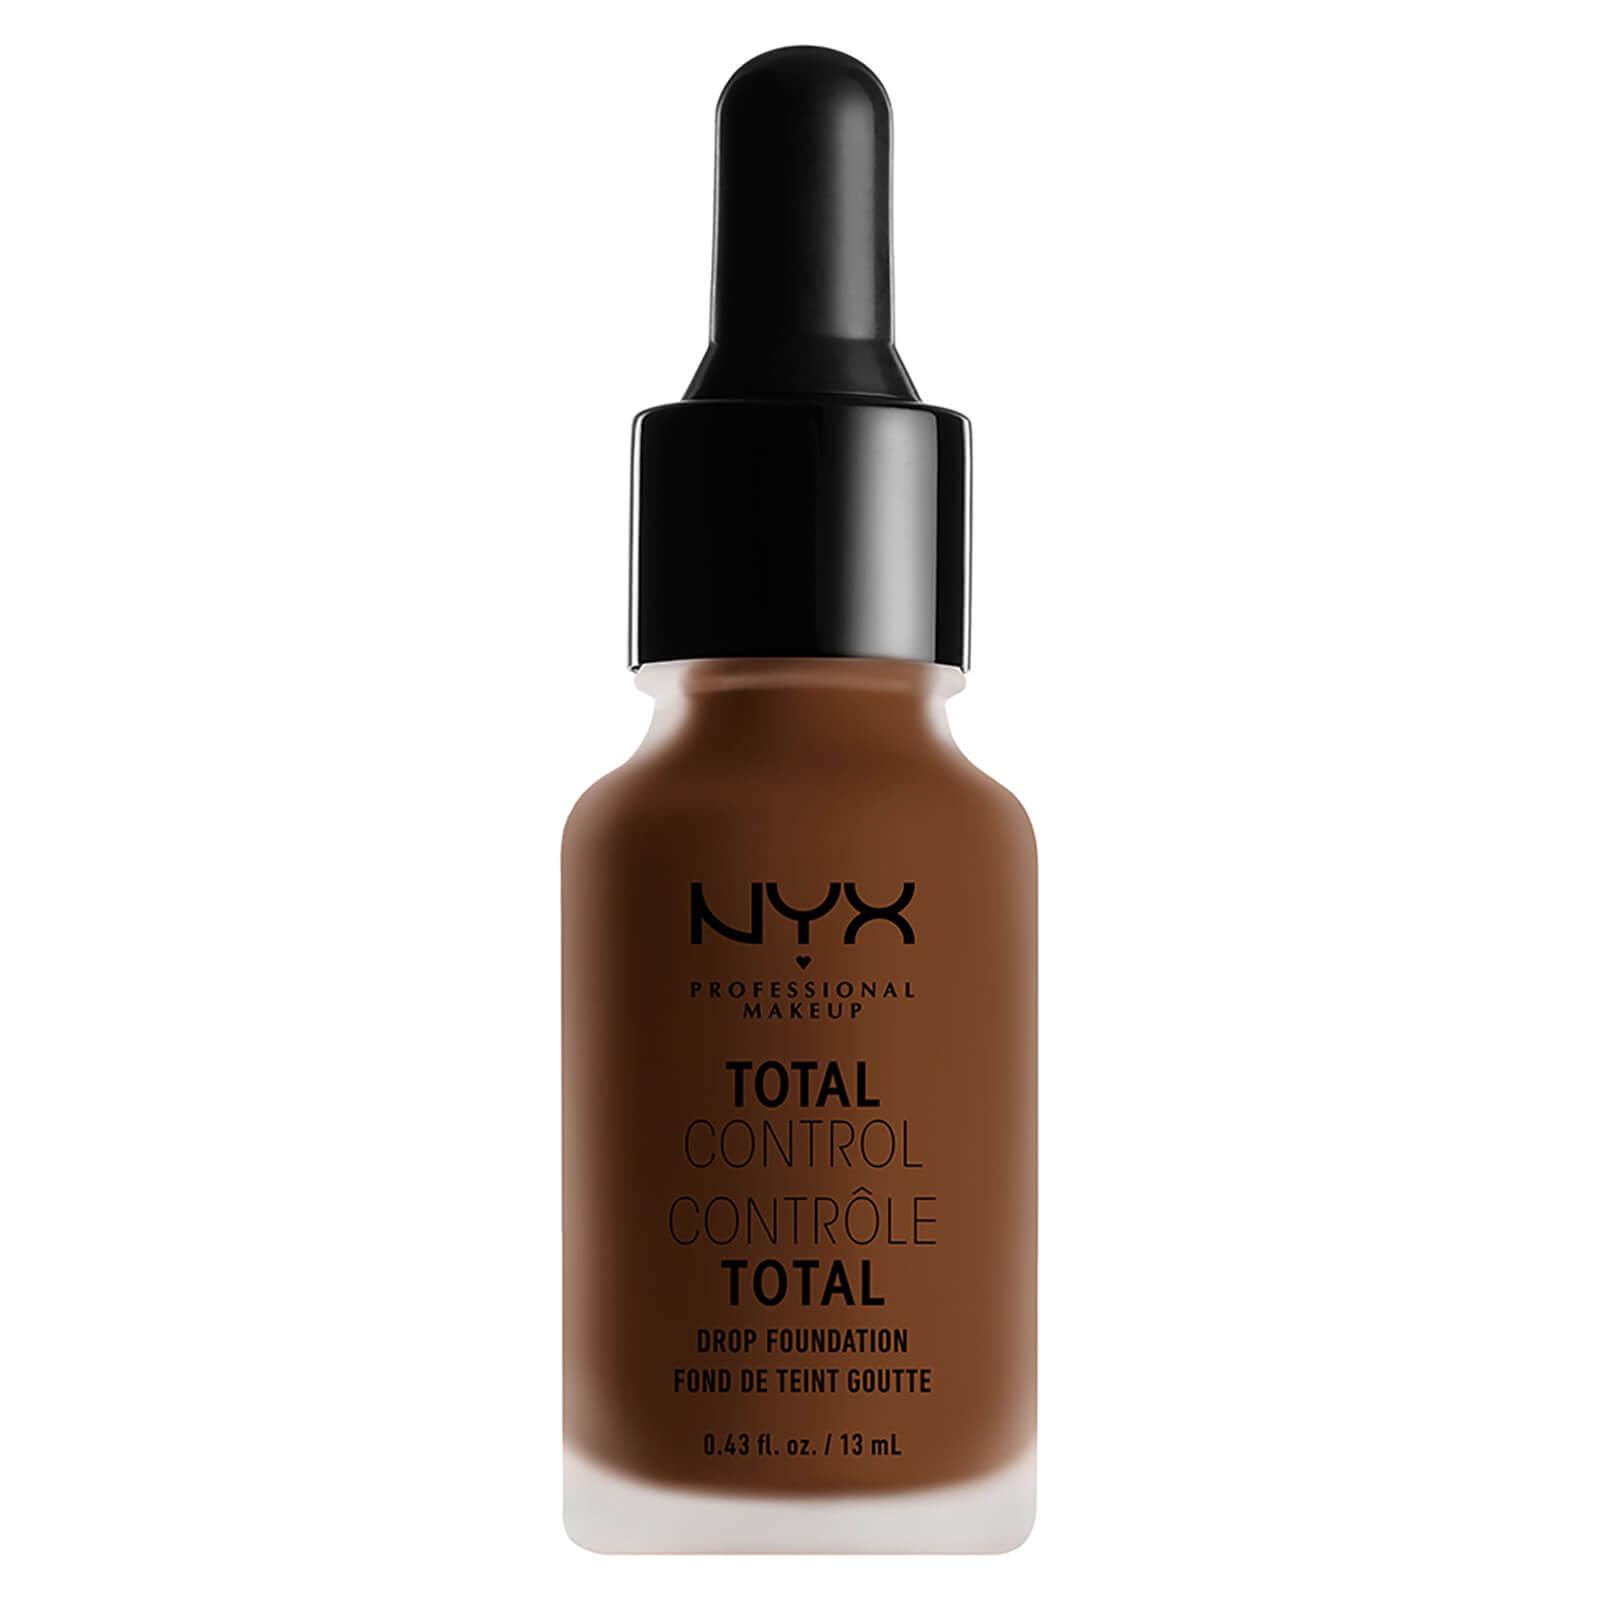 nyx professional makeup total control drop foundation (various shades) - mocha